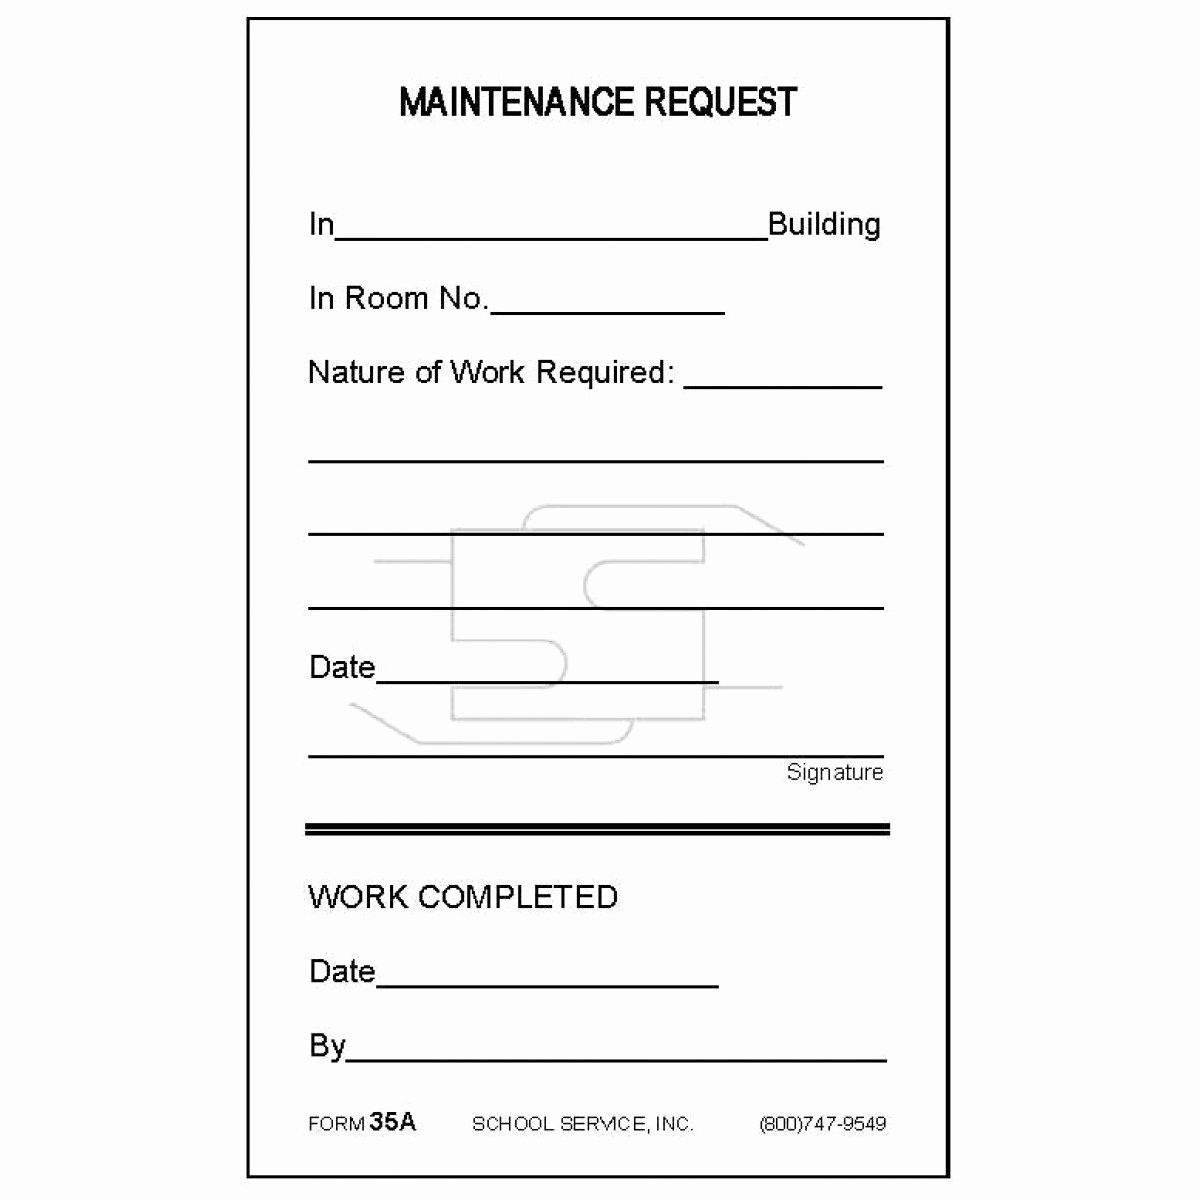 Maintenance Service Request form Template Unique 35a Maintenance Request Padded forms